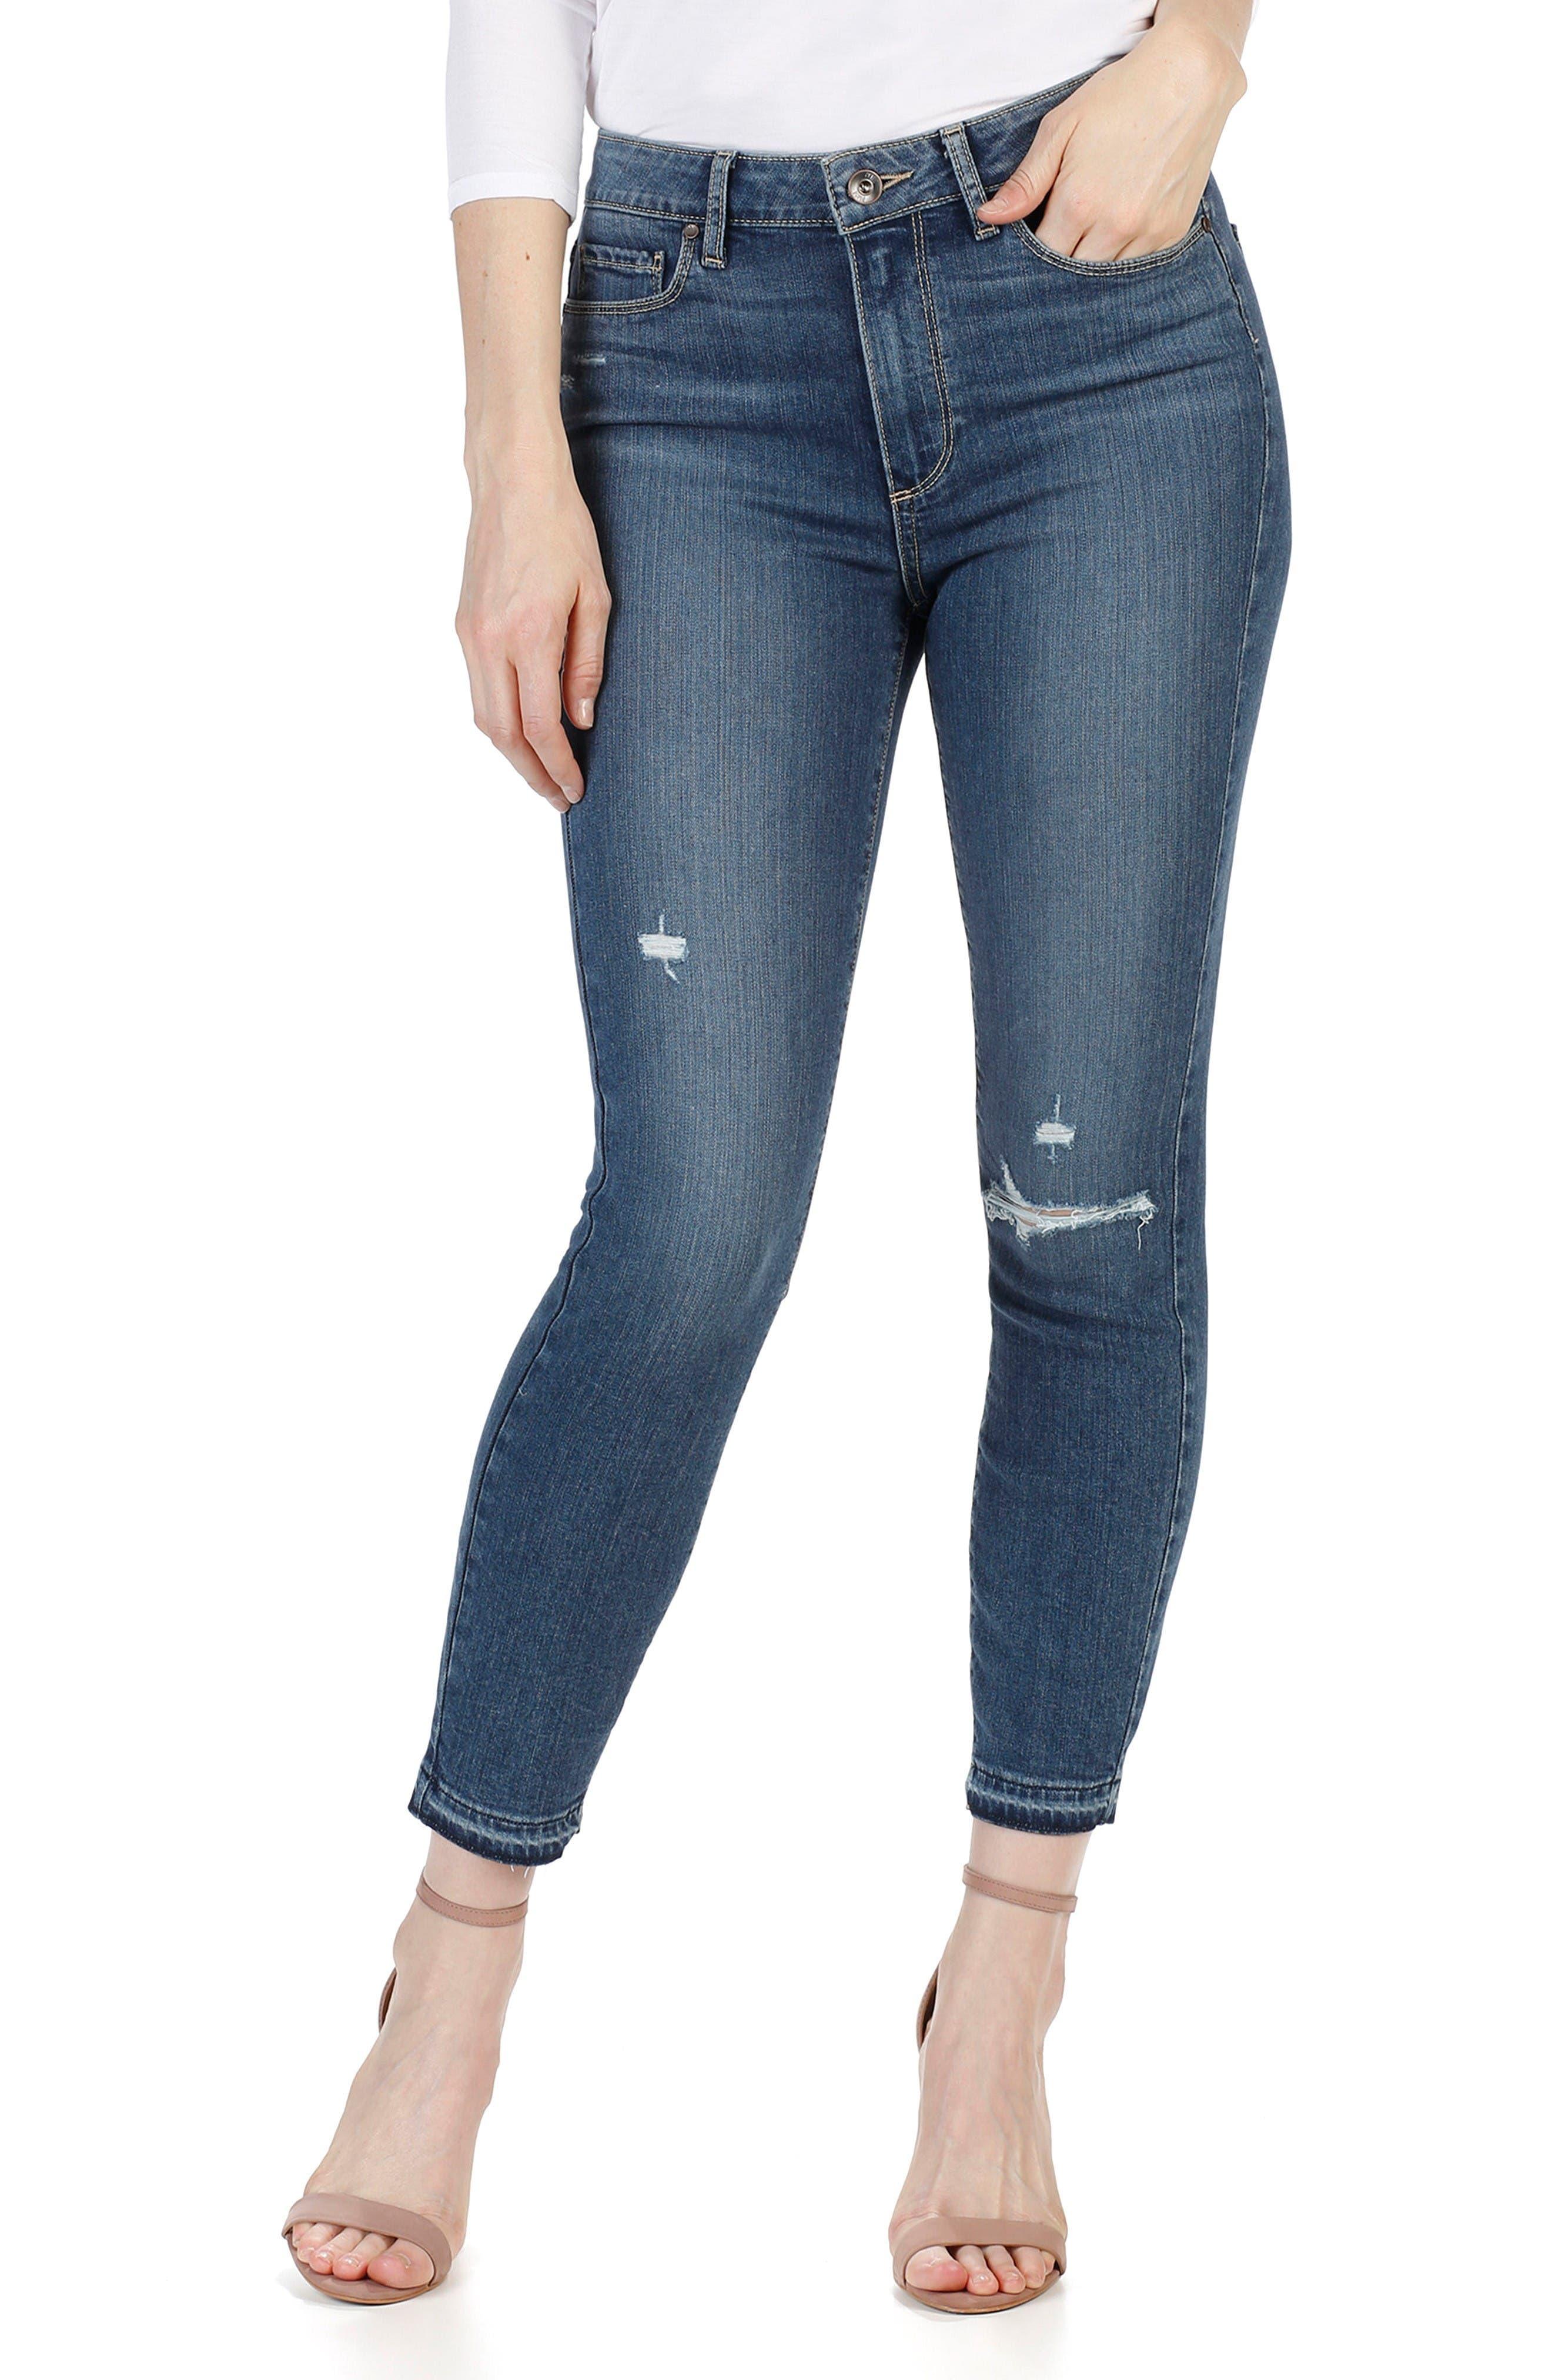 PAIGE Transcend - Hoxton High Waist Crop Skinny Jeans